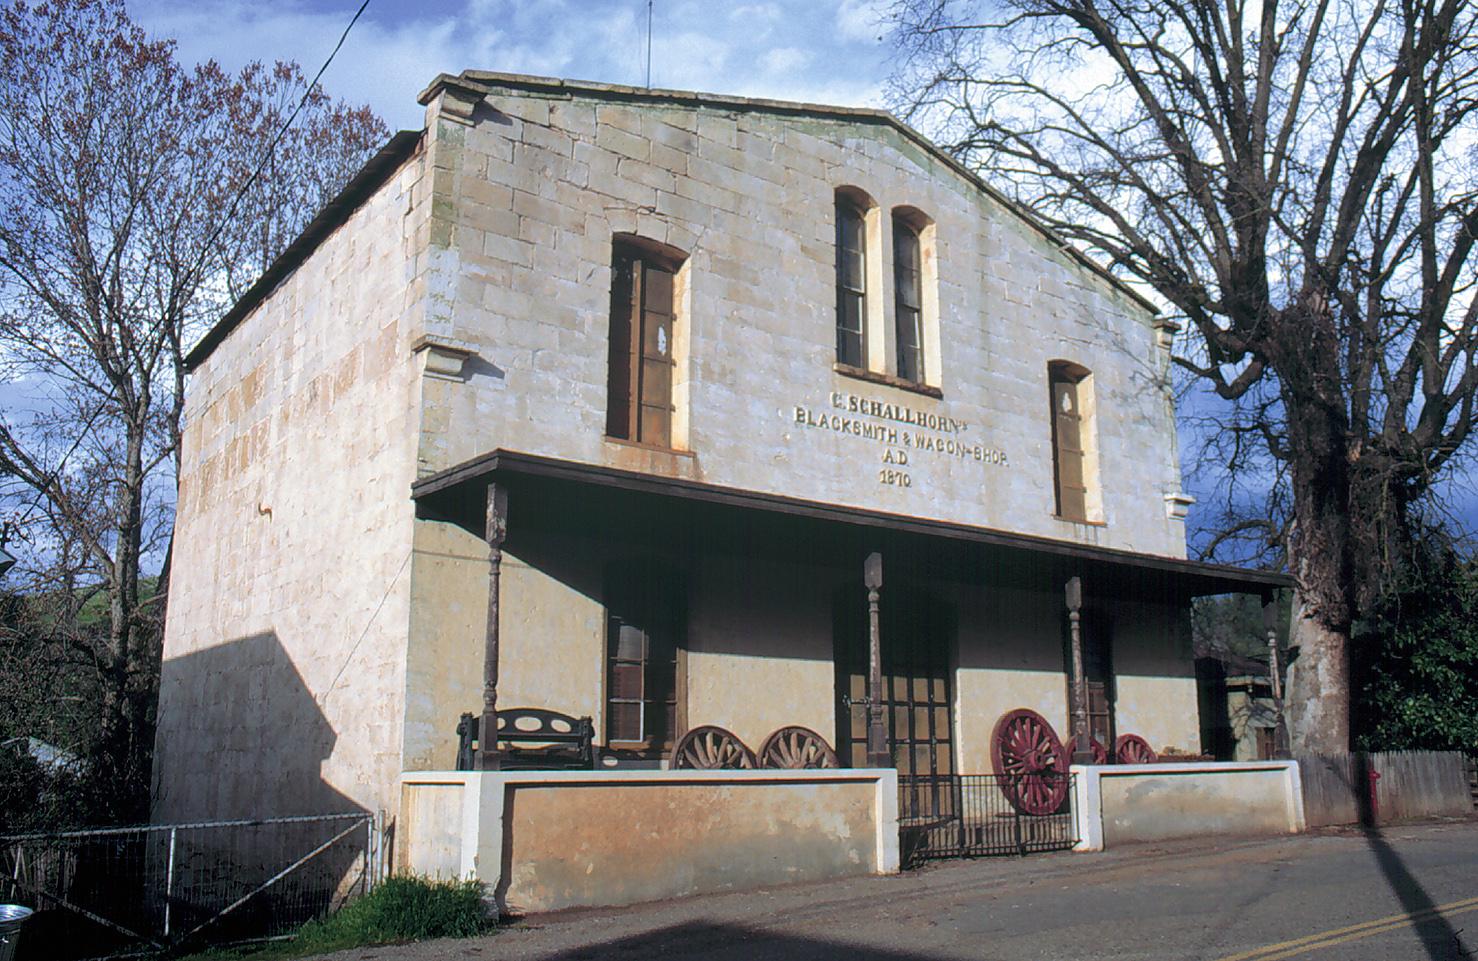 Fiddletown California - Schalhorne Blacksmith.jpg